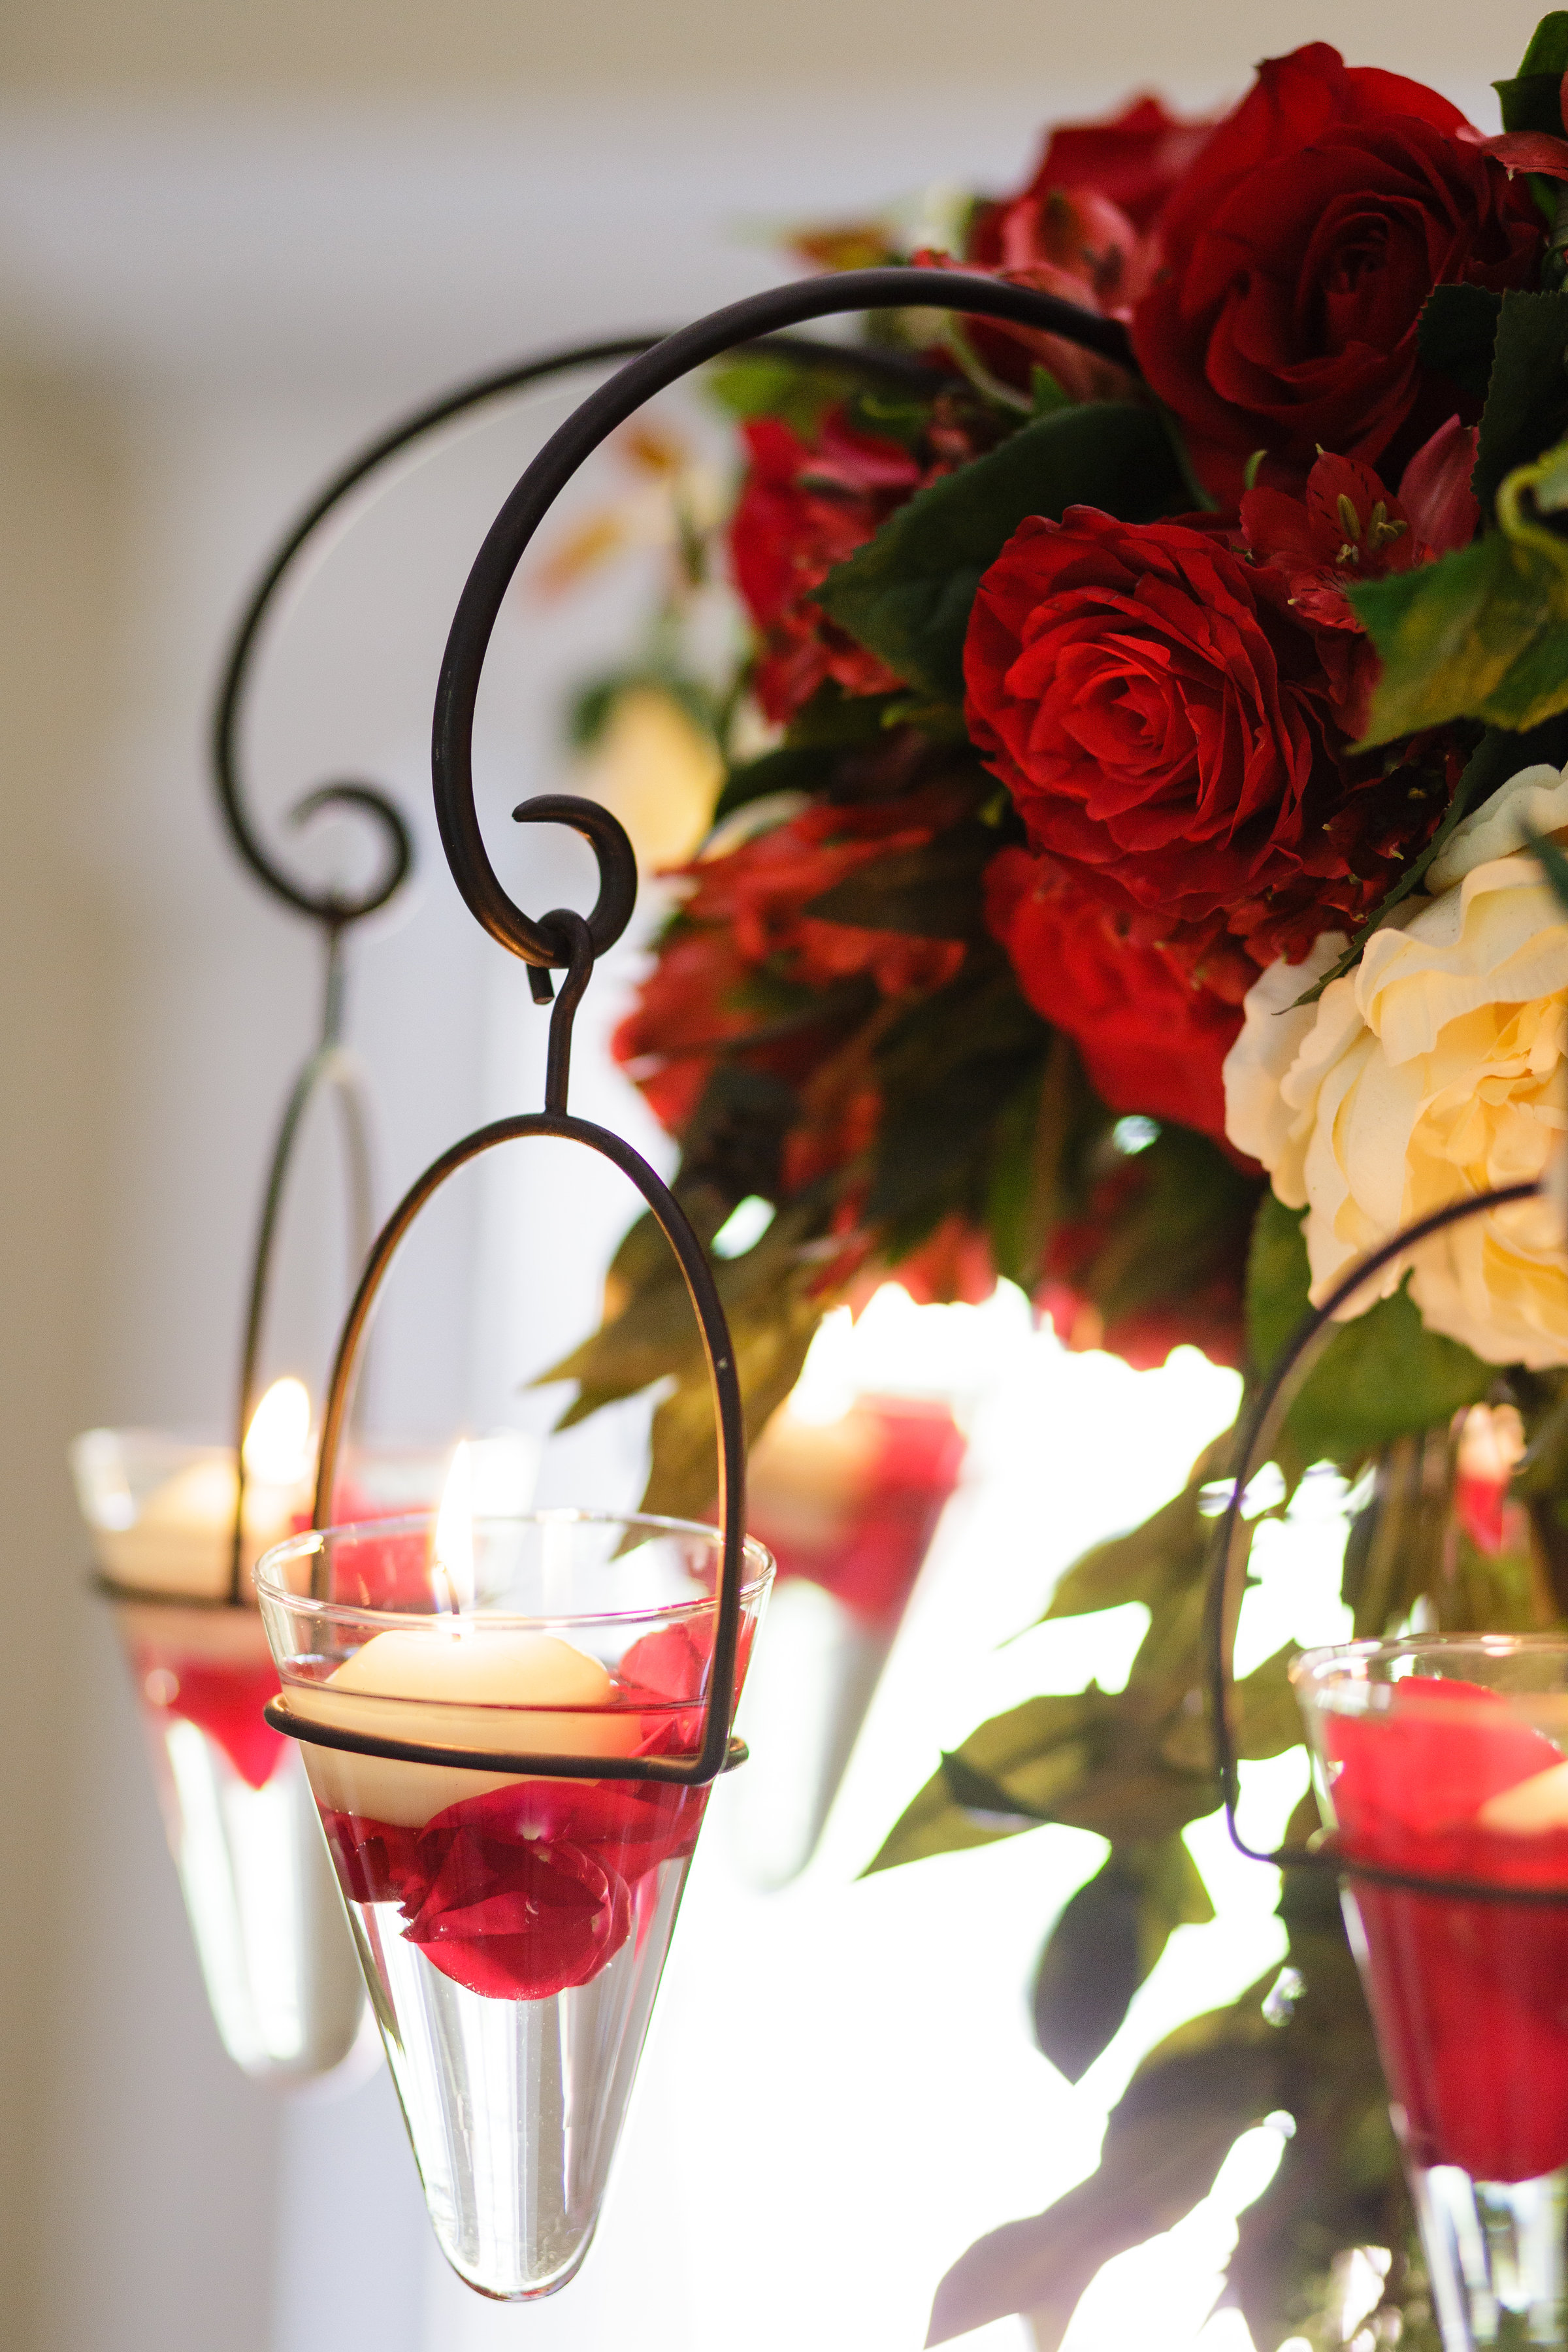 08 Tall Centerpiece Red Rose White Rose Floating Candles Philadelphia Wedding Florist Spanish Rose (1).jpg